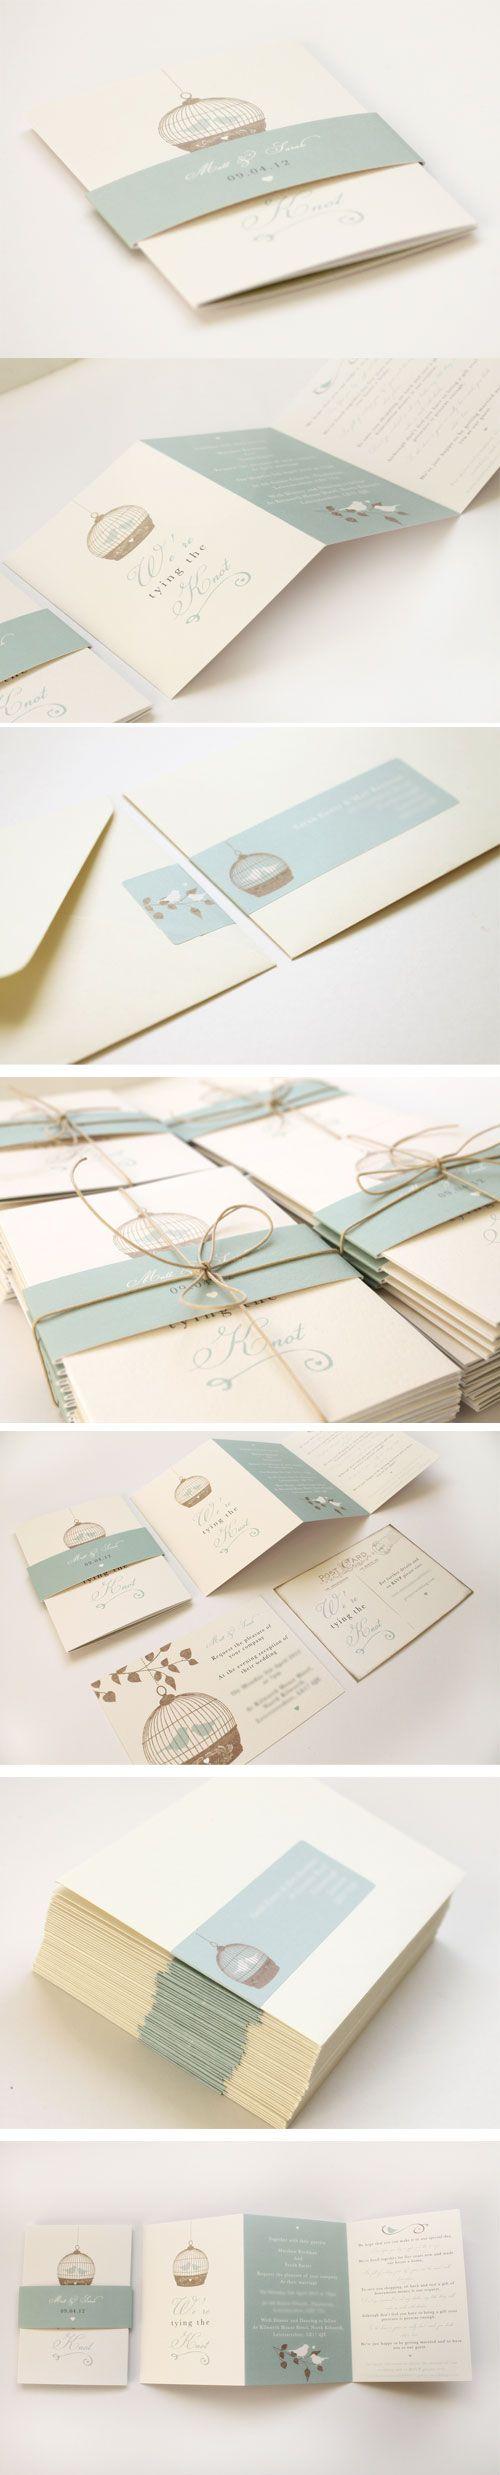 birdcage wedding invitations by studio seed | Invitations ...